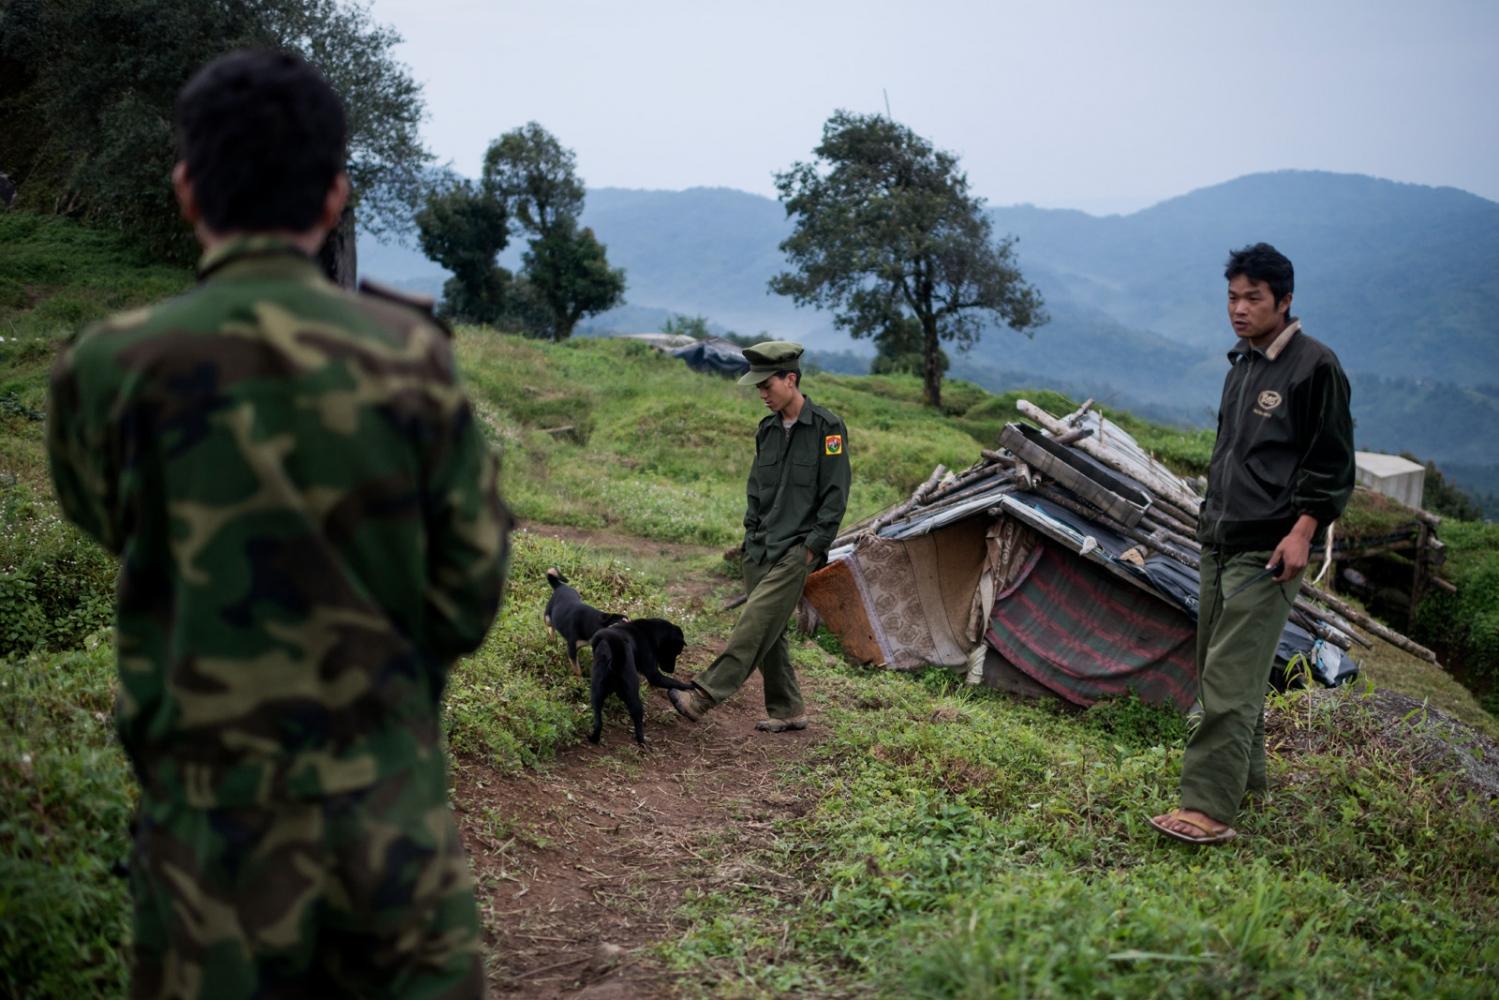 Art and Documentary Photography - Loading VS-Escalating-violence-Myanmar-10.JPG